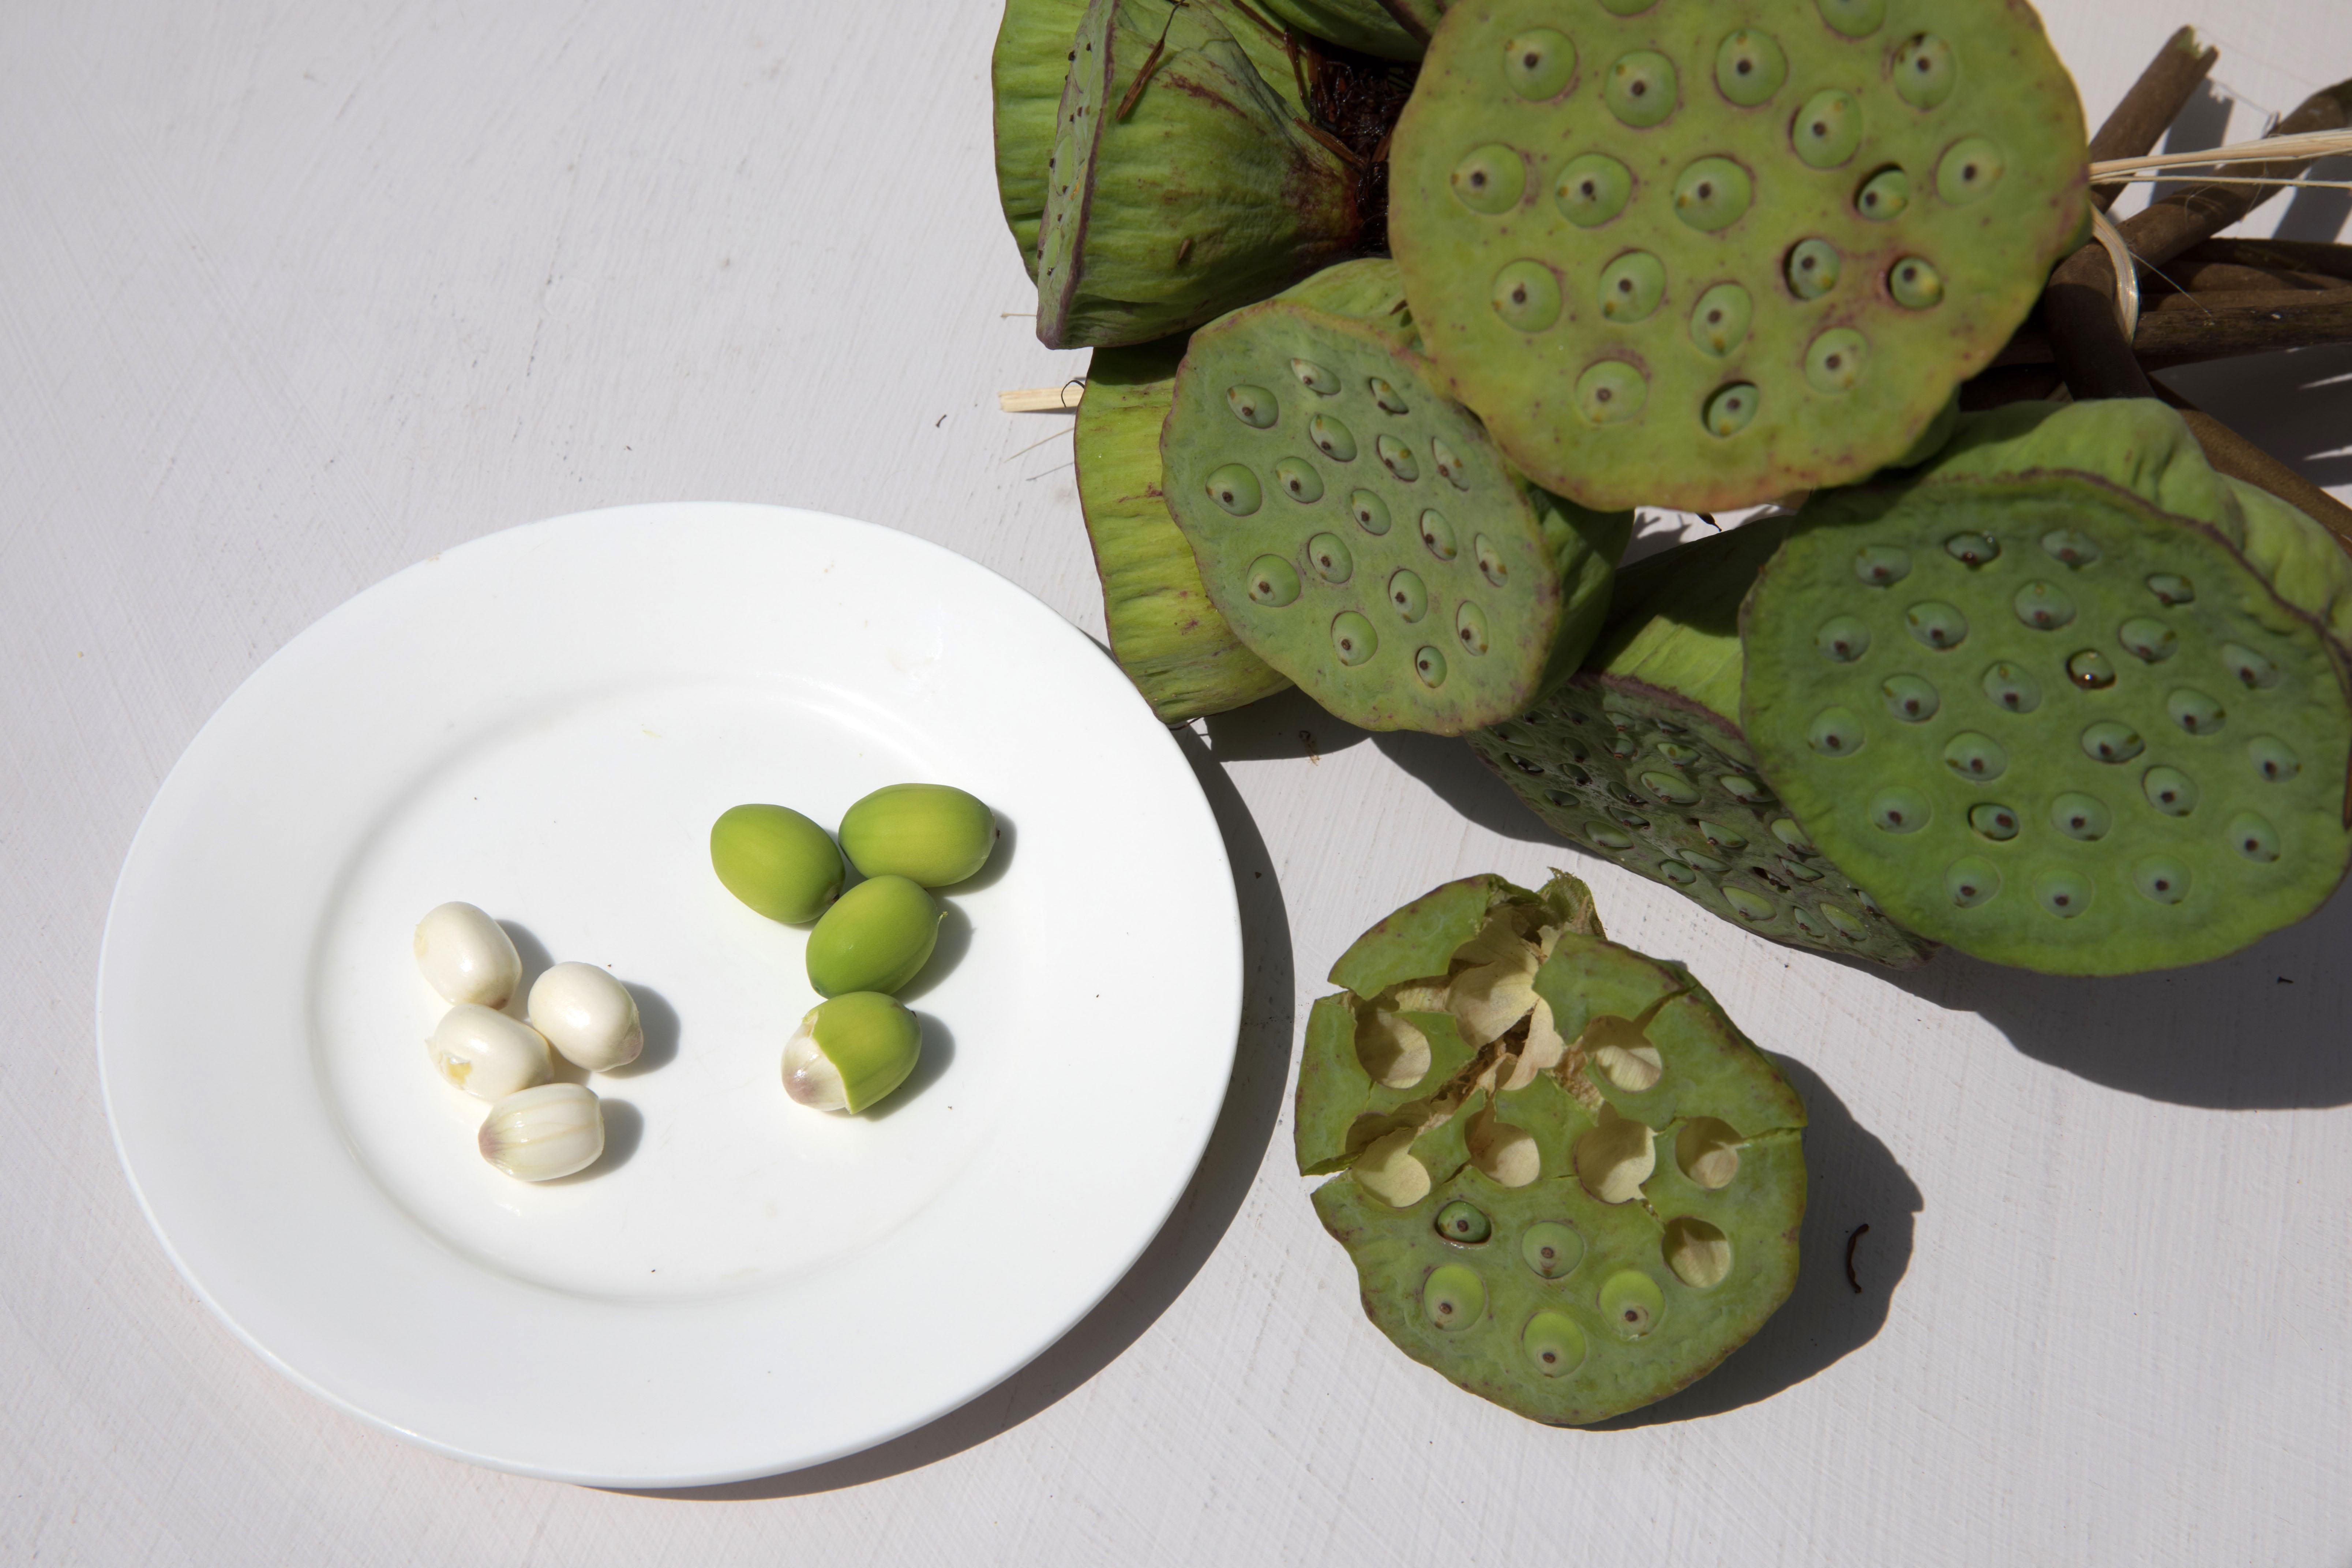 Nelumbo nucifera wikipedia fresh lotus seeds ready to eat izmirmasajfo Image collections